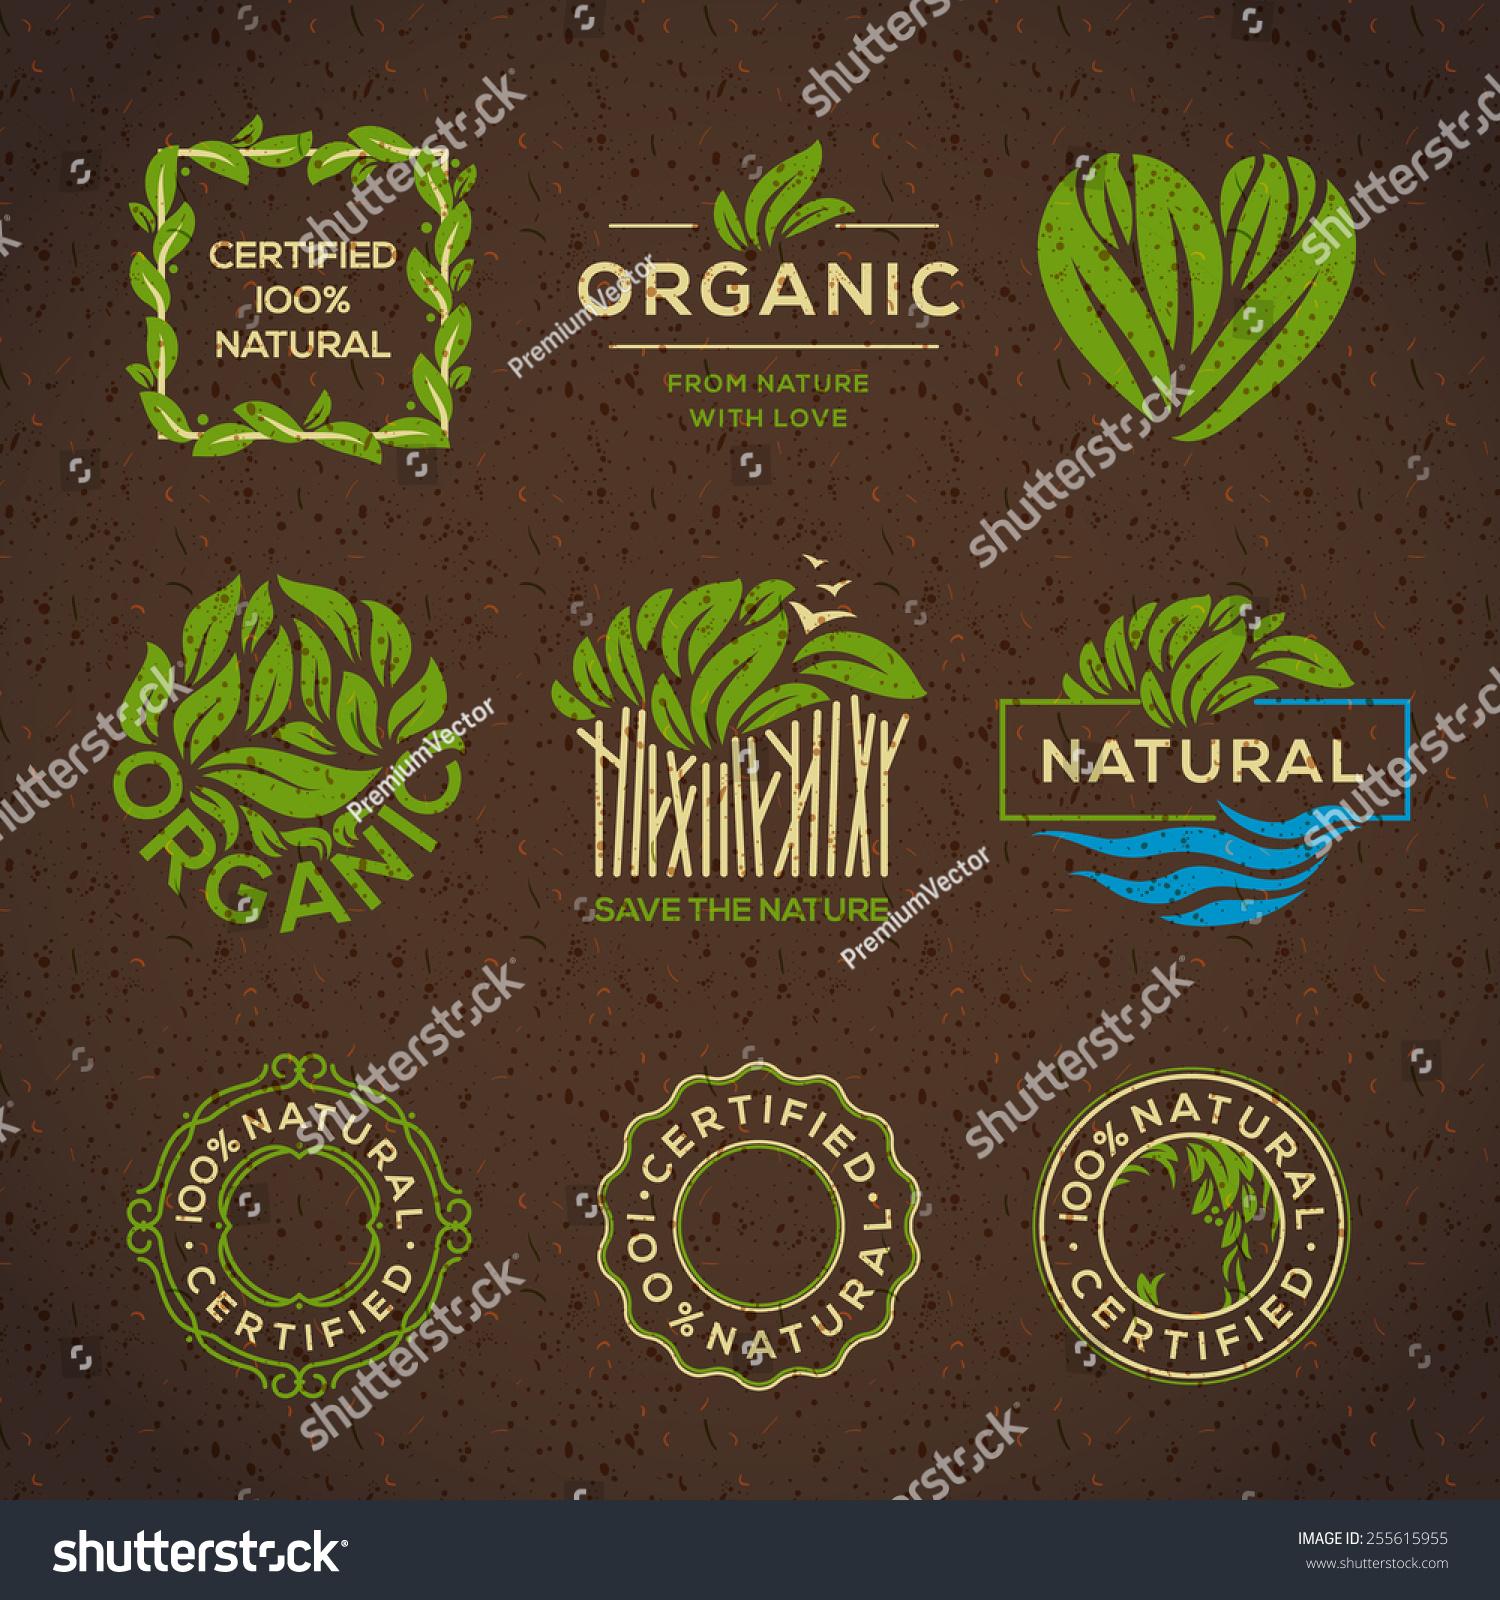 Healthy Food Restaurant Names